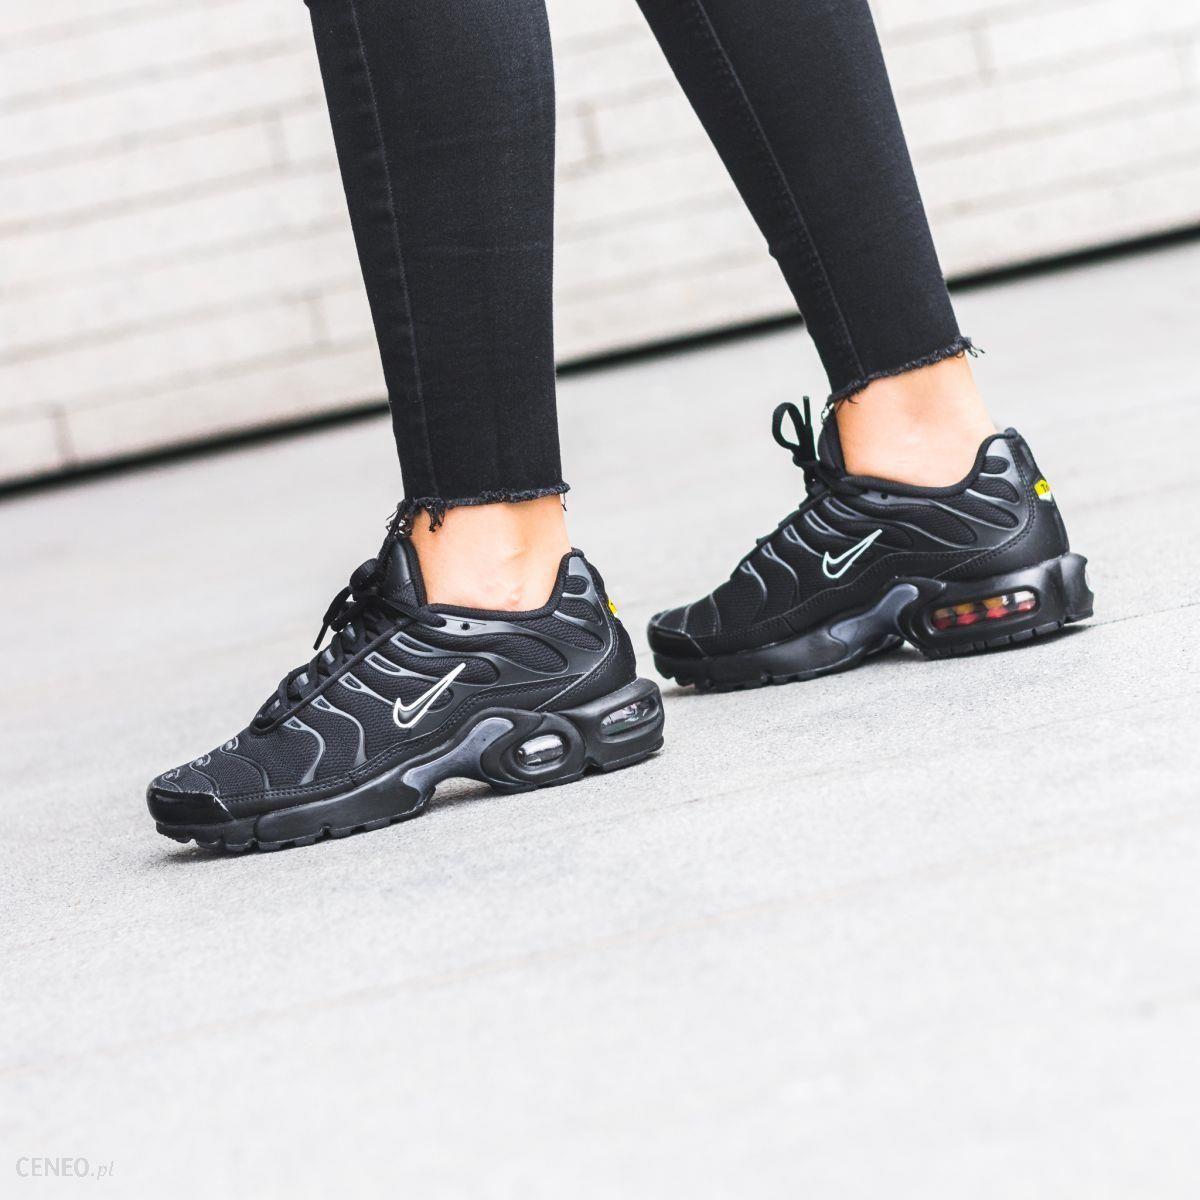 Nike Air Max Plus TN Black Gold w Style Kick ✔️ | Znajdź